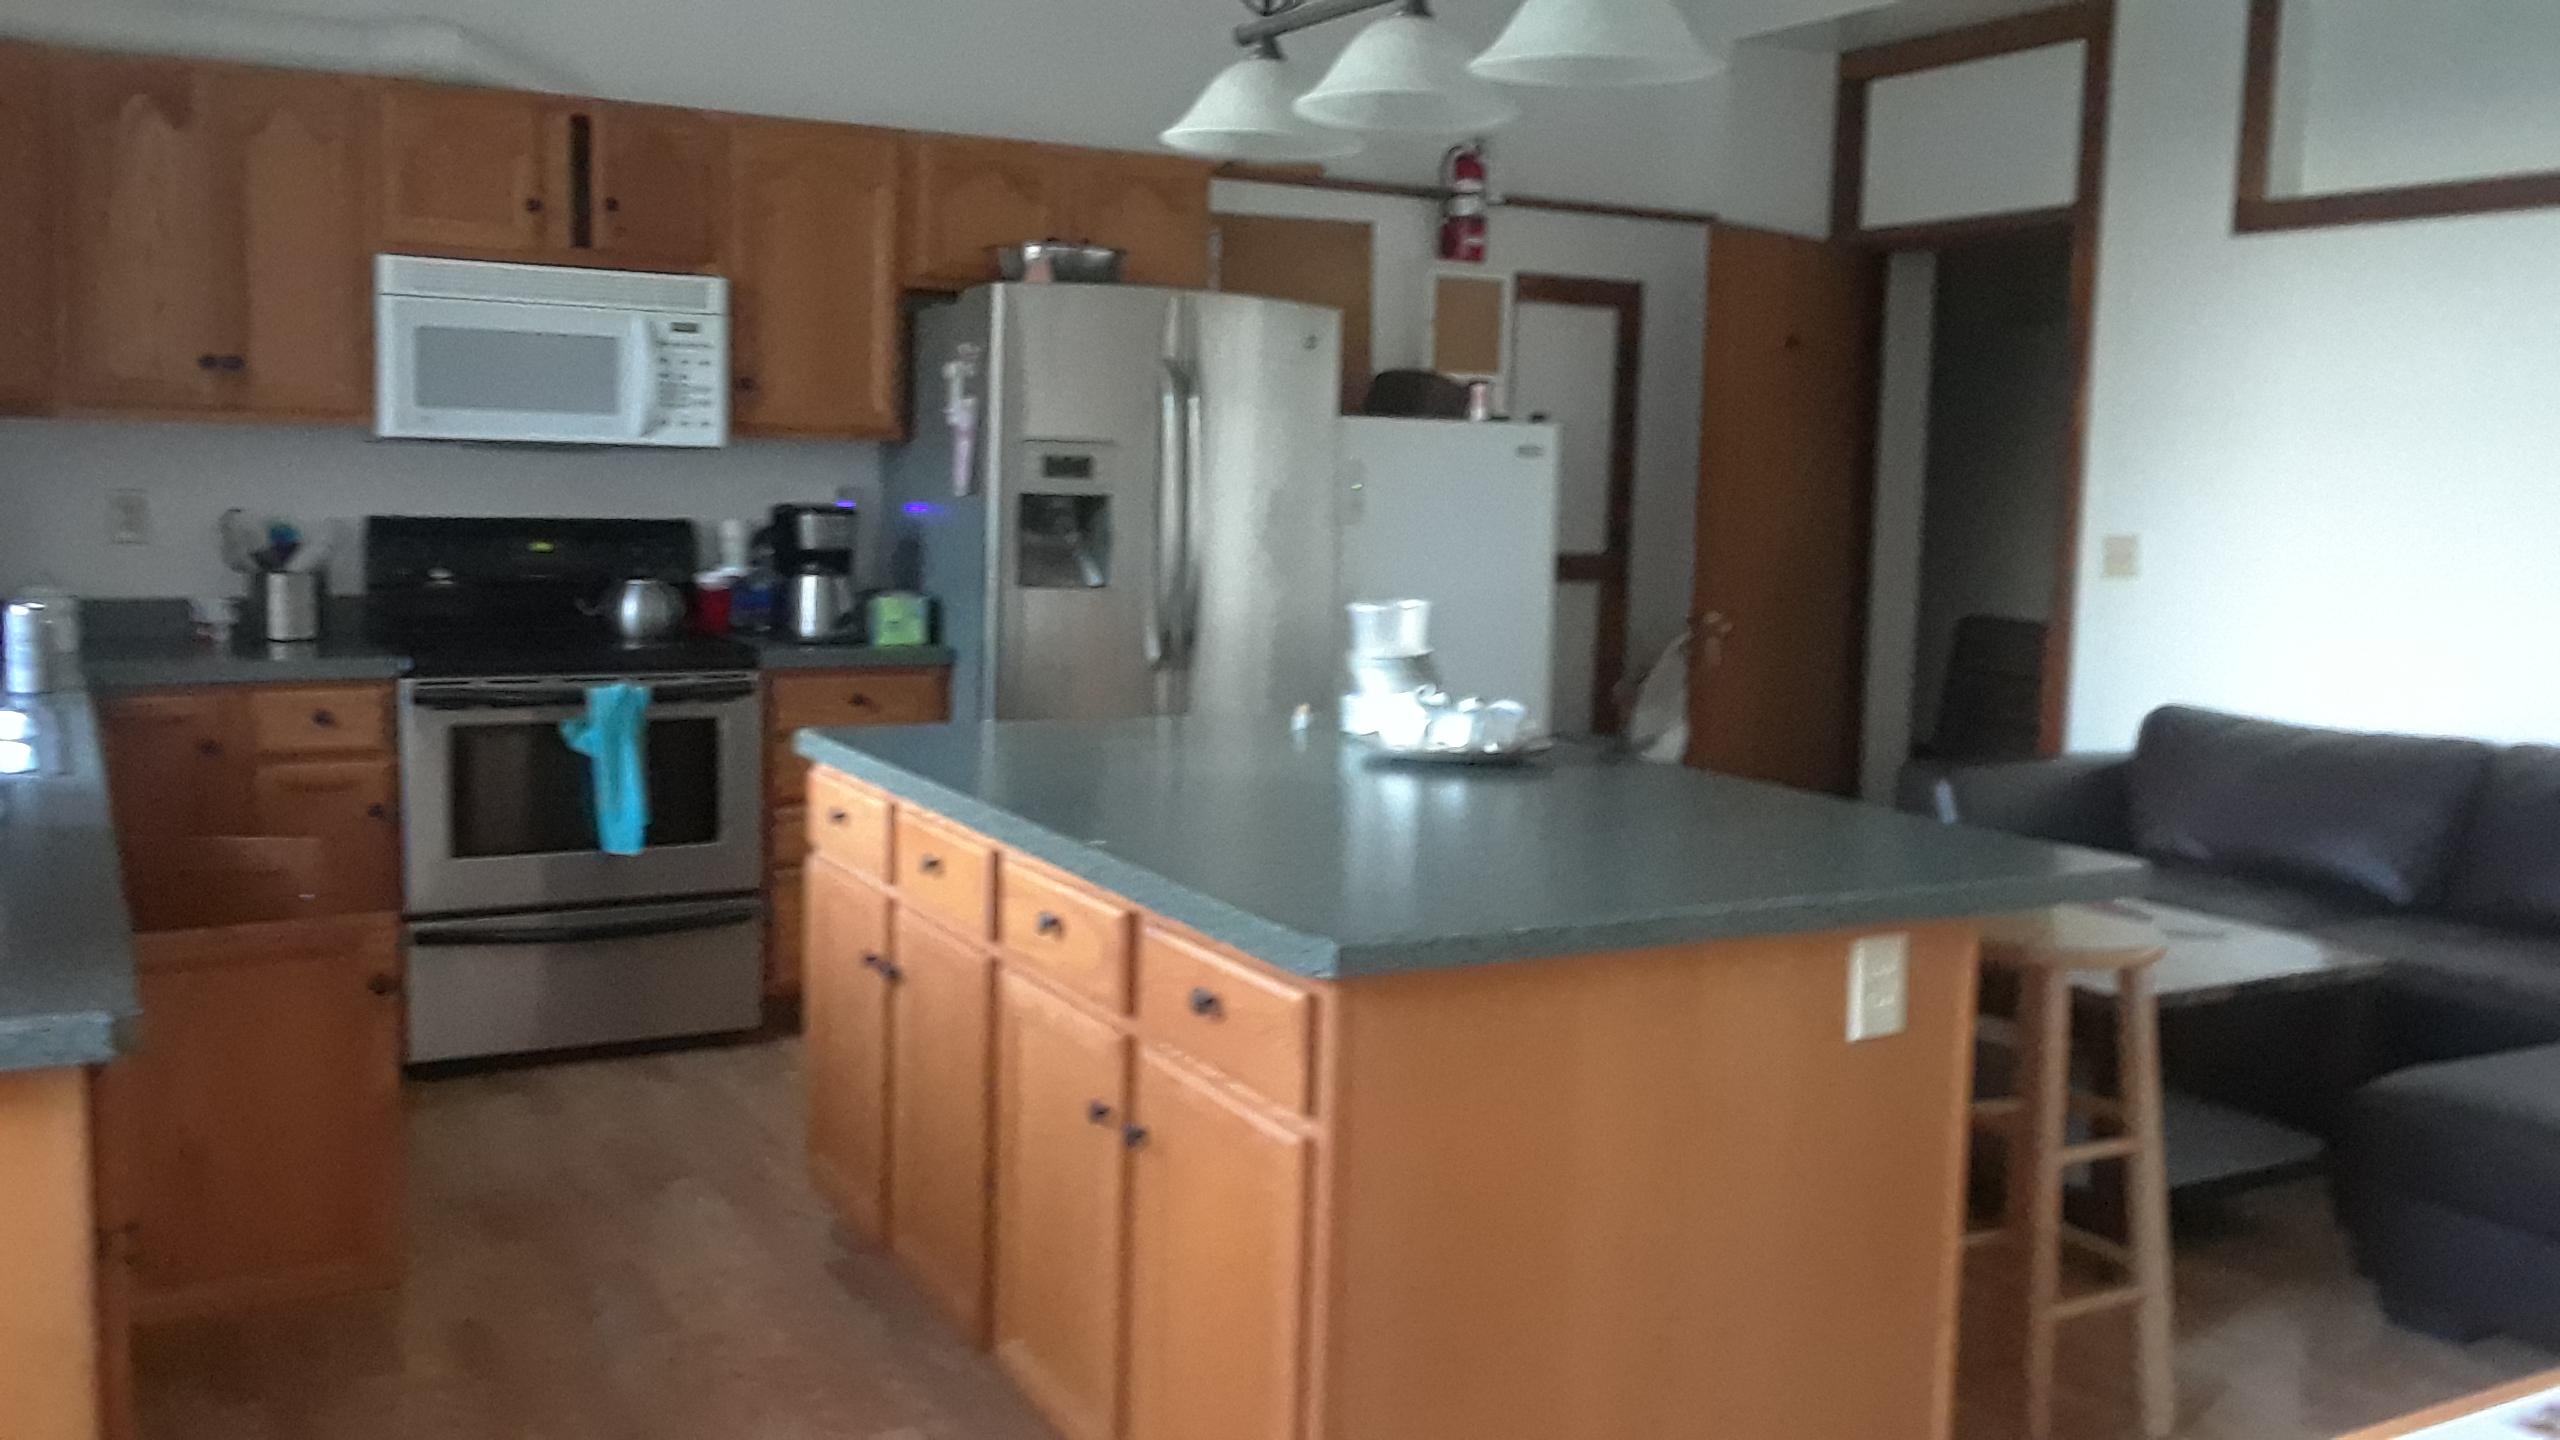 St Michael's seminary kitchen